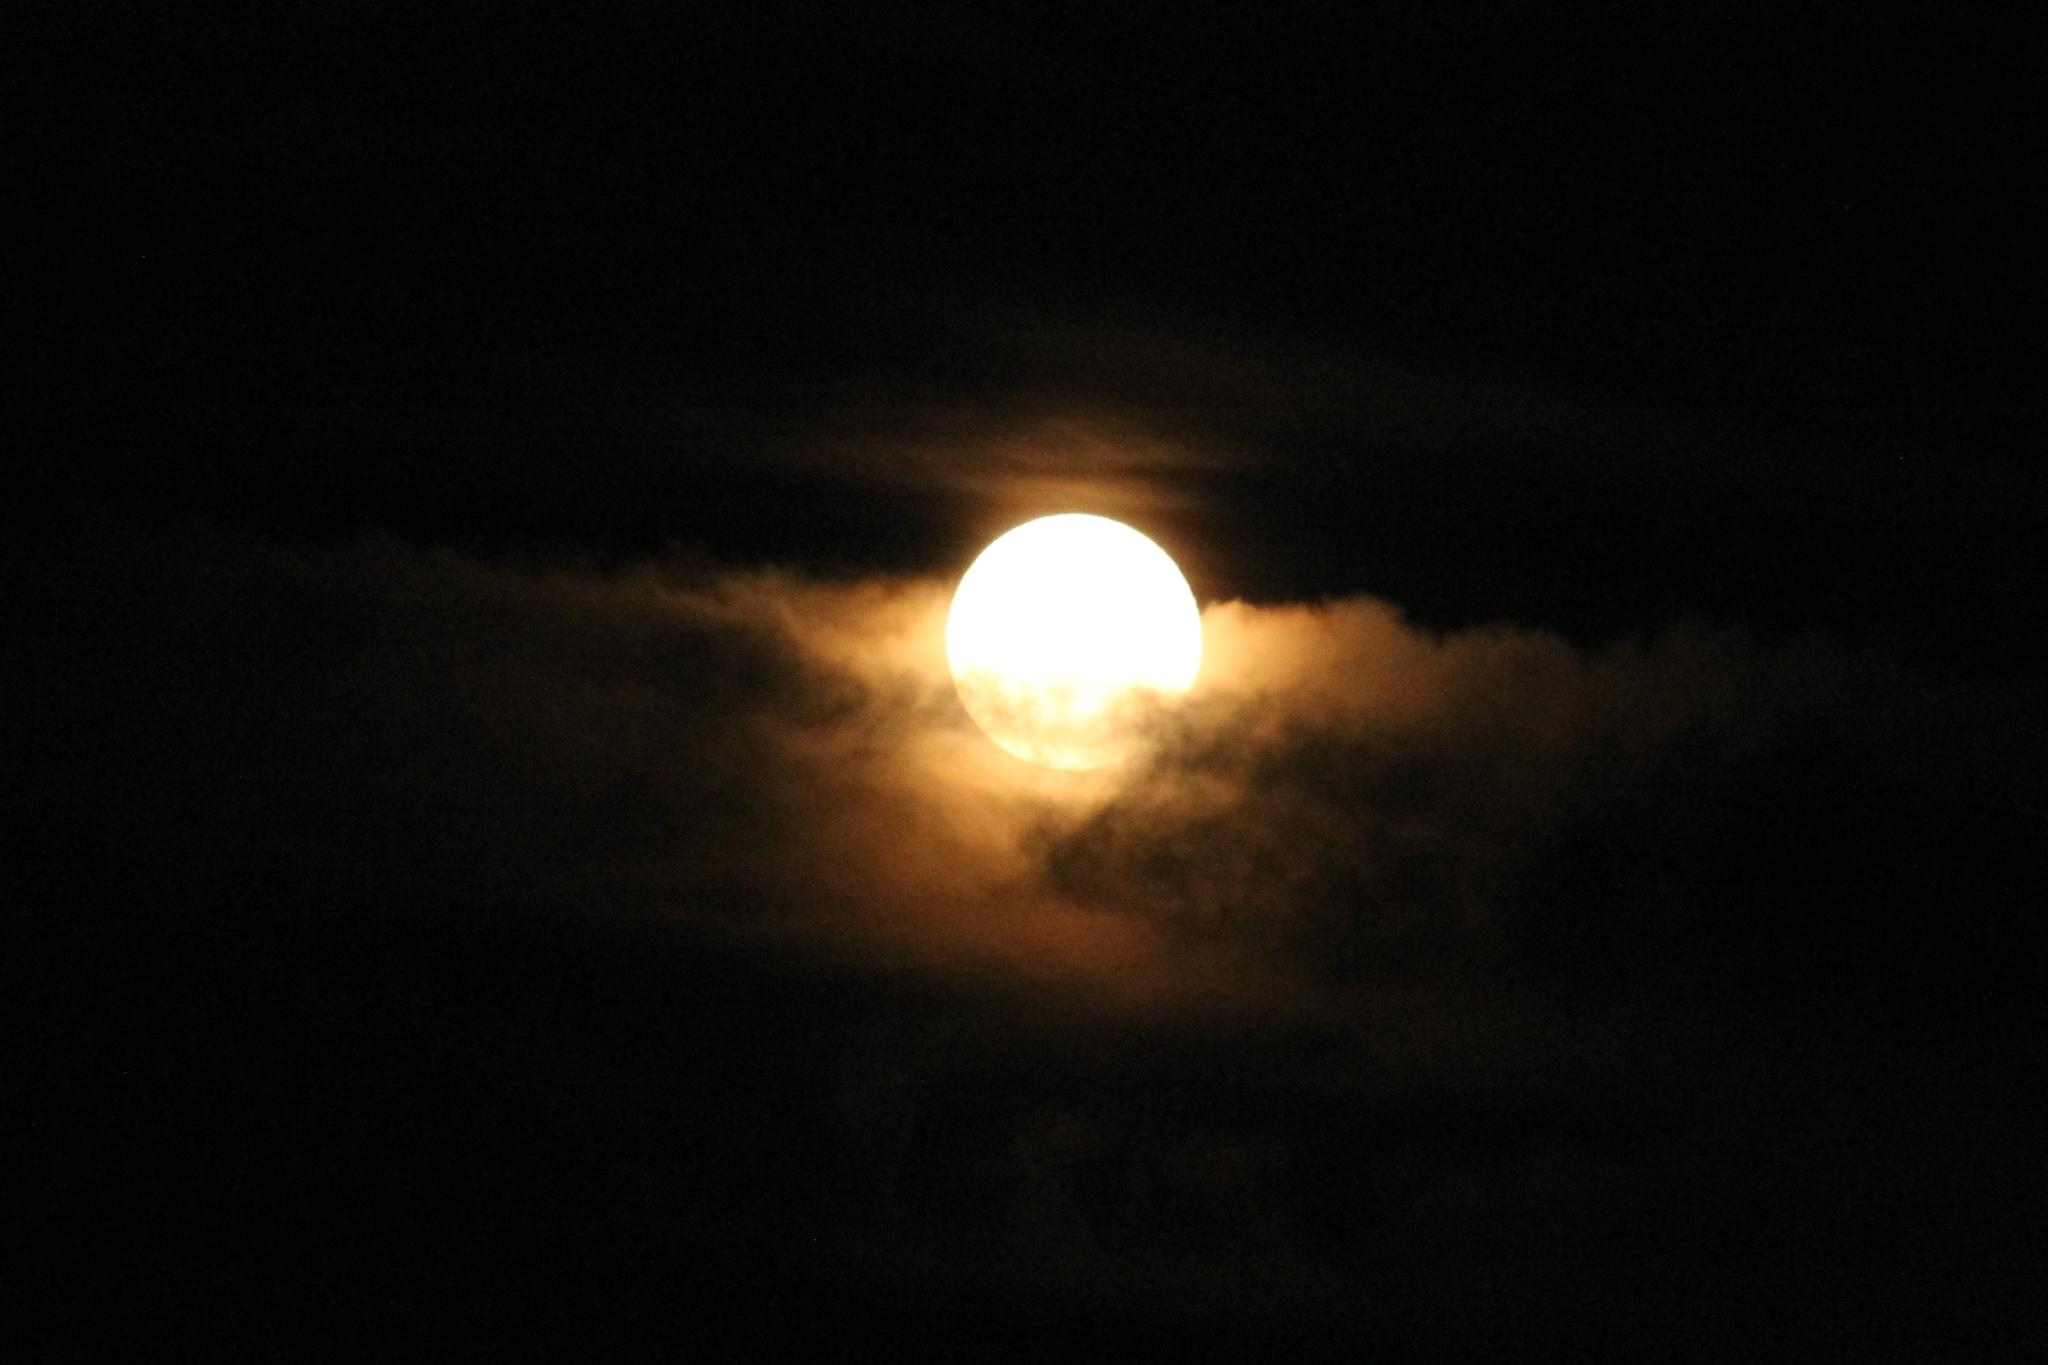 Misty moon by Ali Sarre